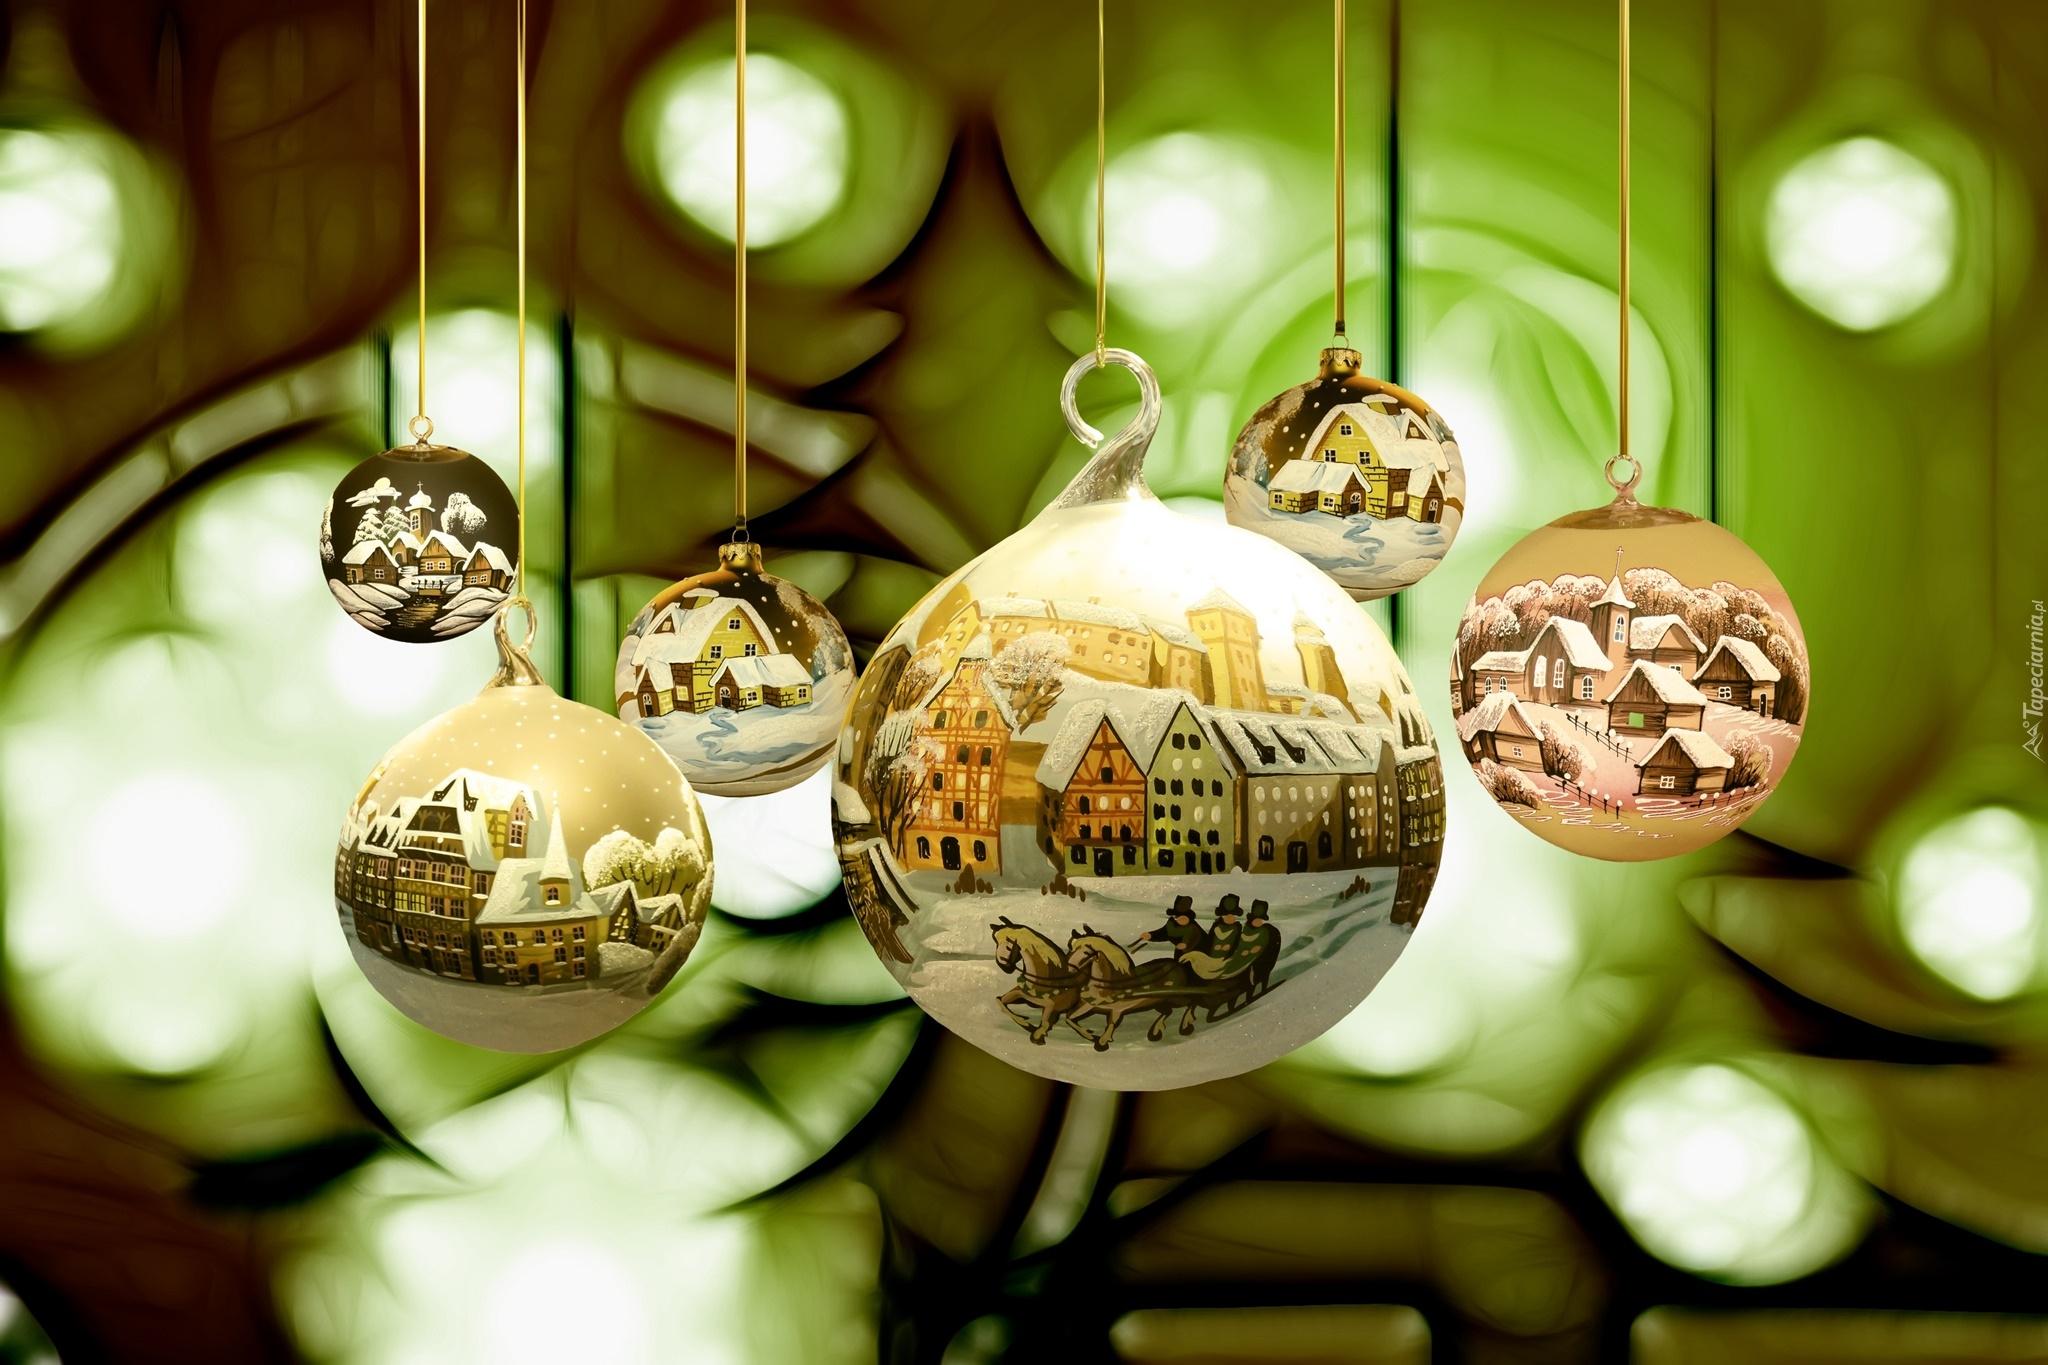 Bo onarodzeniowe bombki for Nostalgische weihnachtskugeln